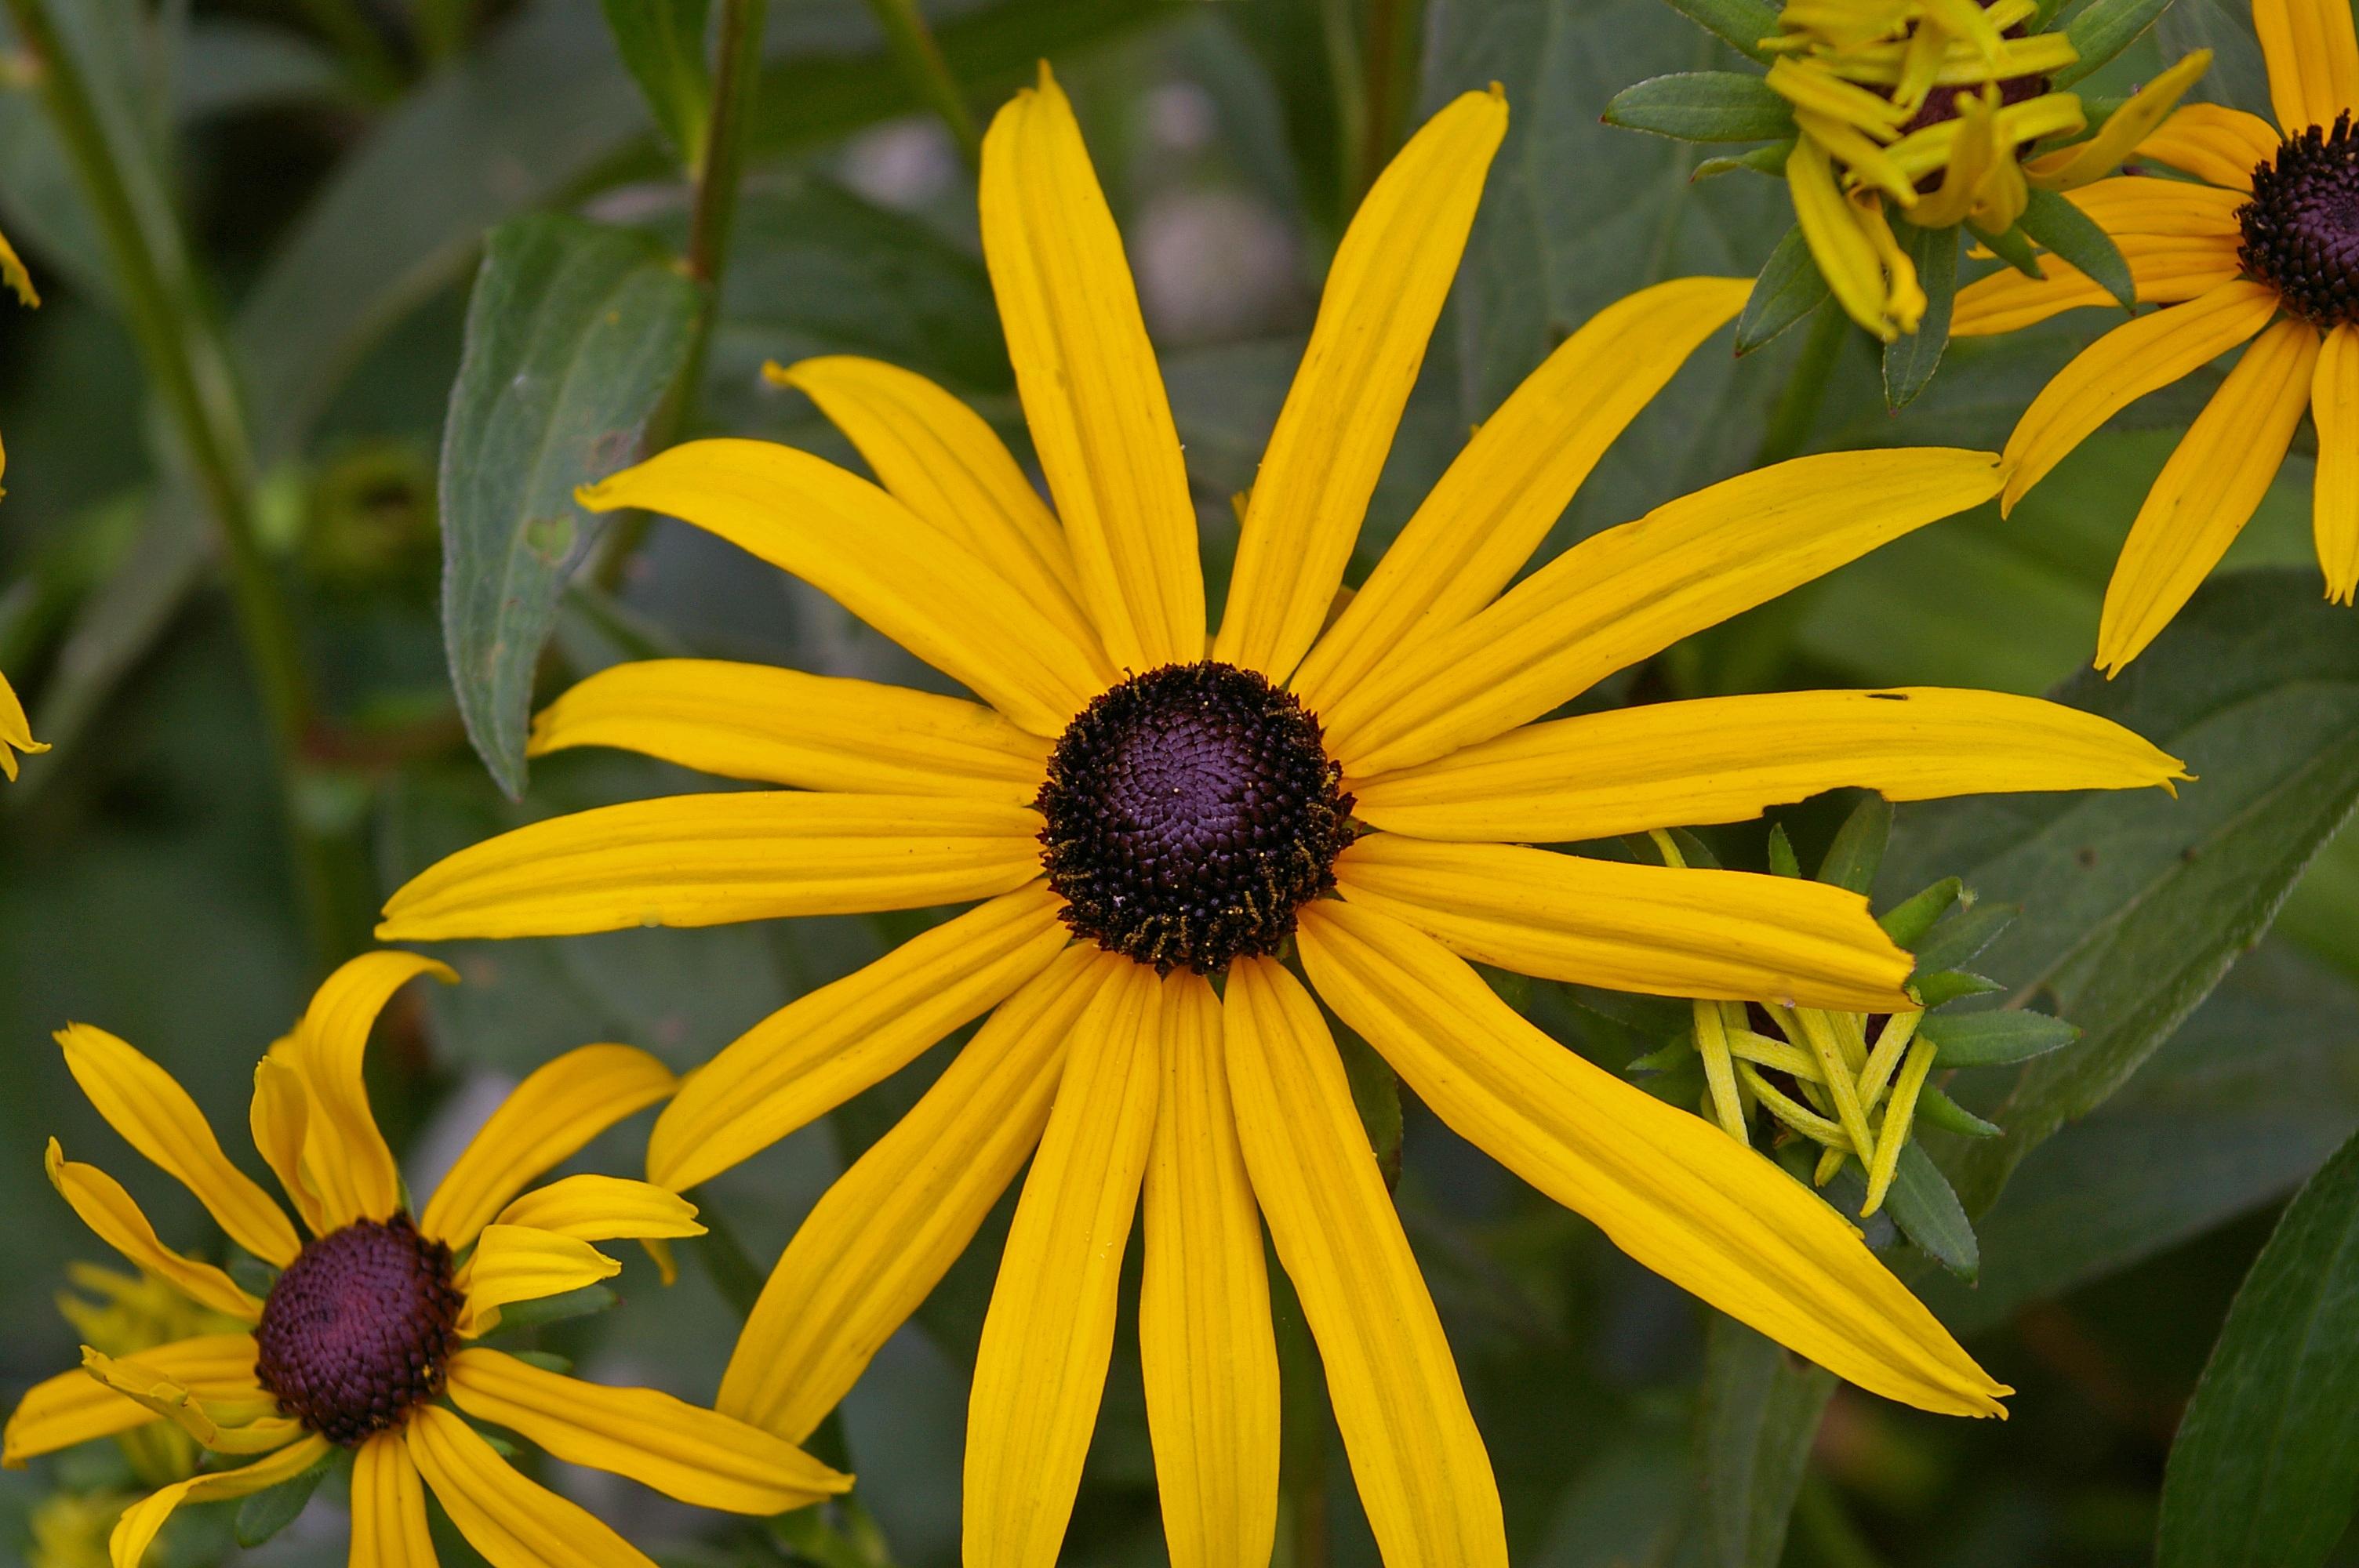 Free Images Nature Blossom Petal Bloom Botany Colorful Flora